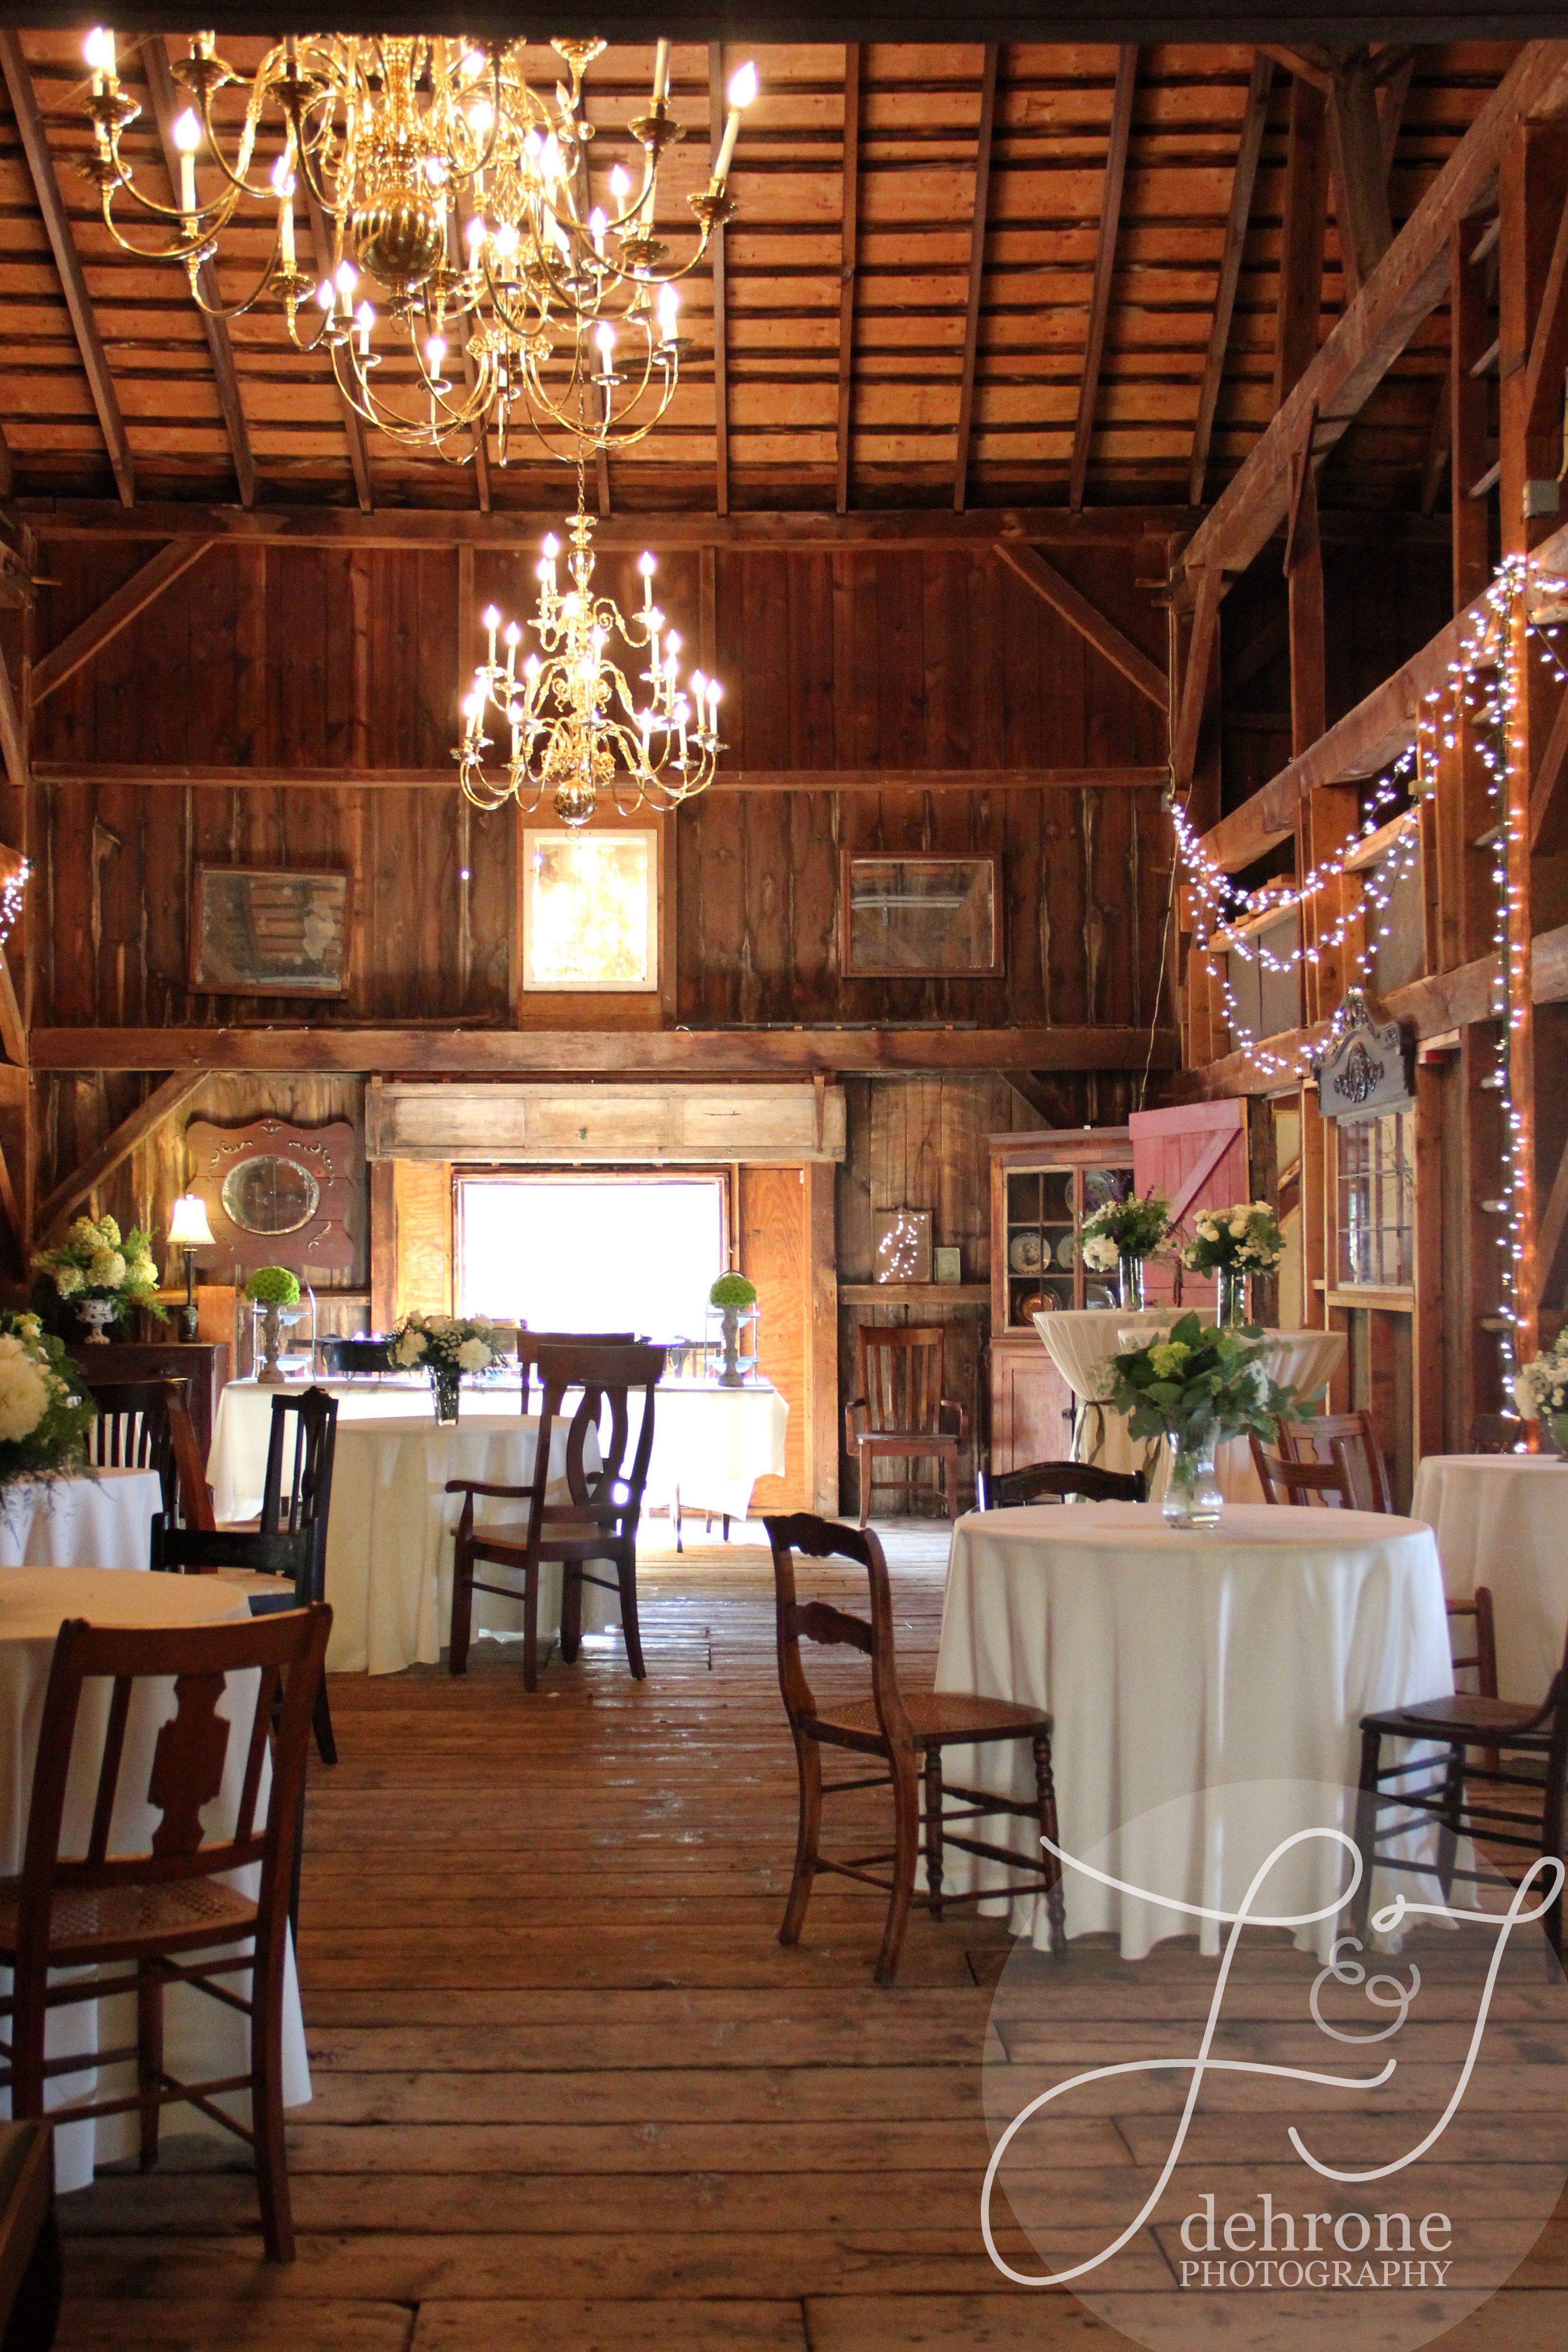 Nj Barn Wedding Venue Barr Wedding Designed By Bilancia Designs Photography By L T Photography Barn Weddings Nj Rustic Wedding Venues Nj Nj Wedding Venues